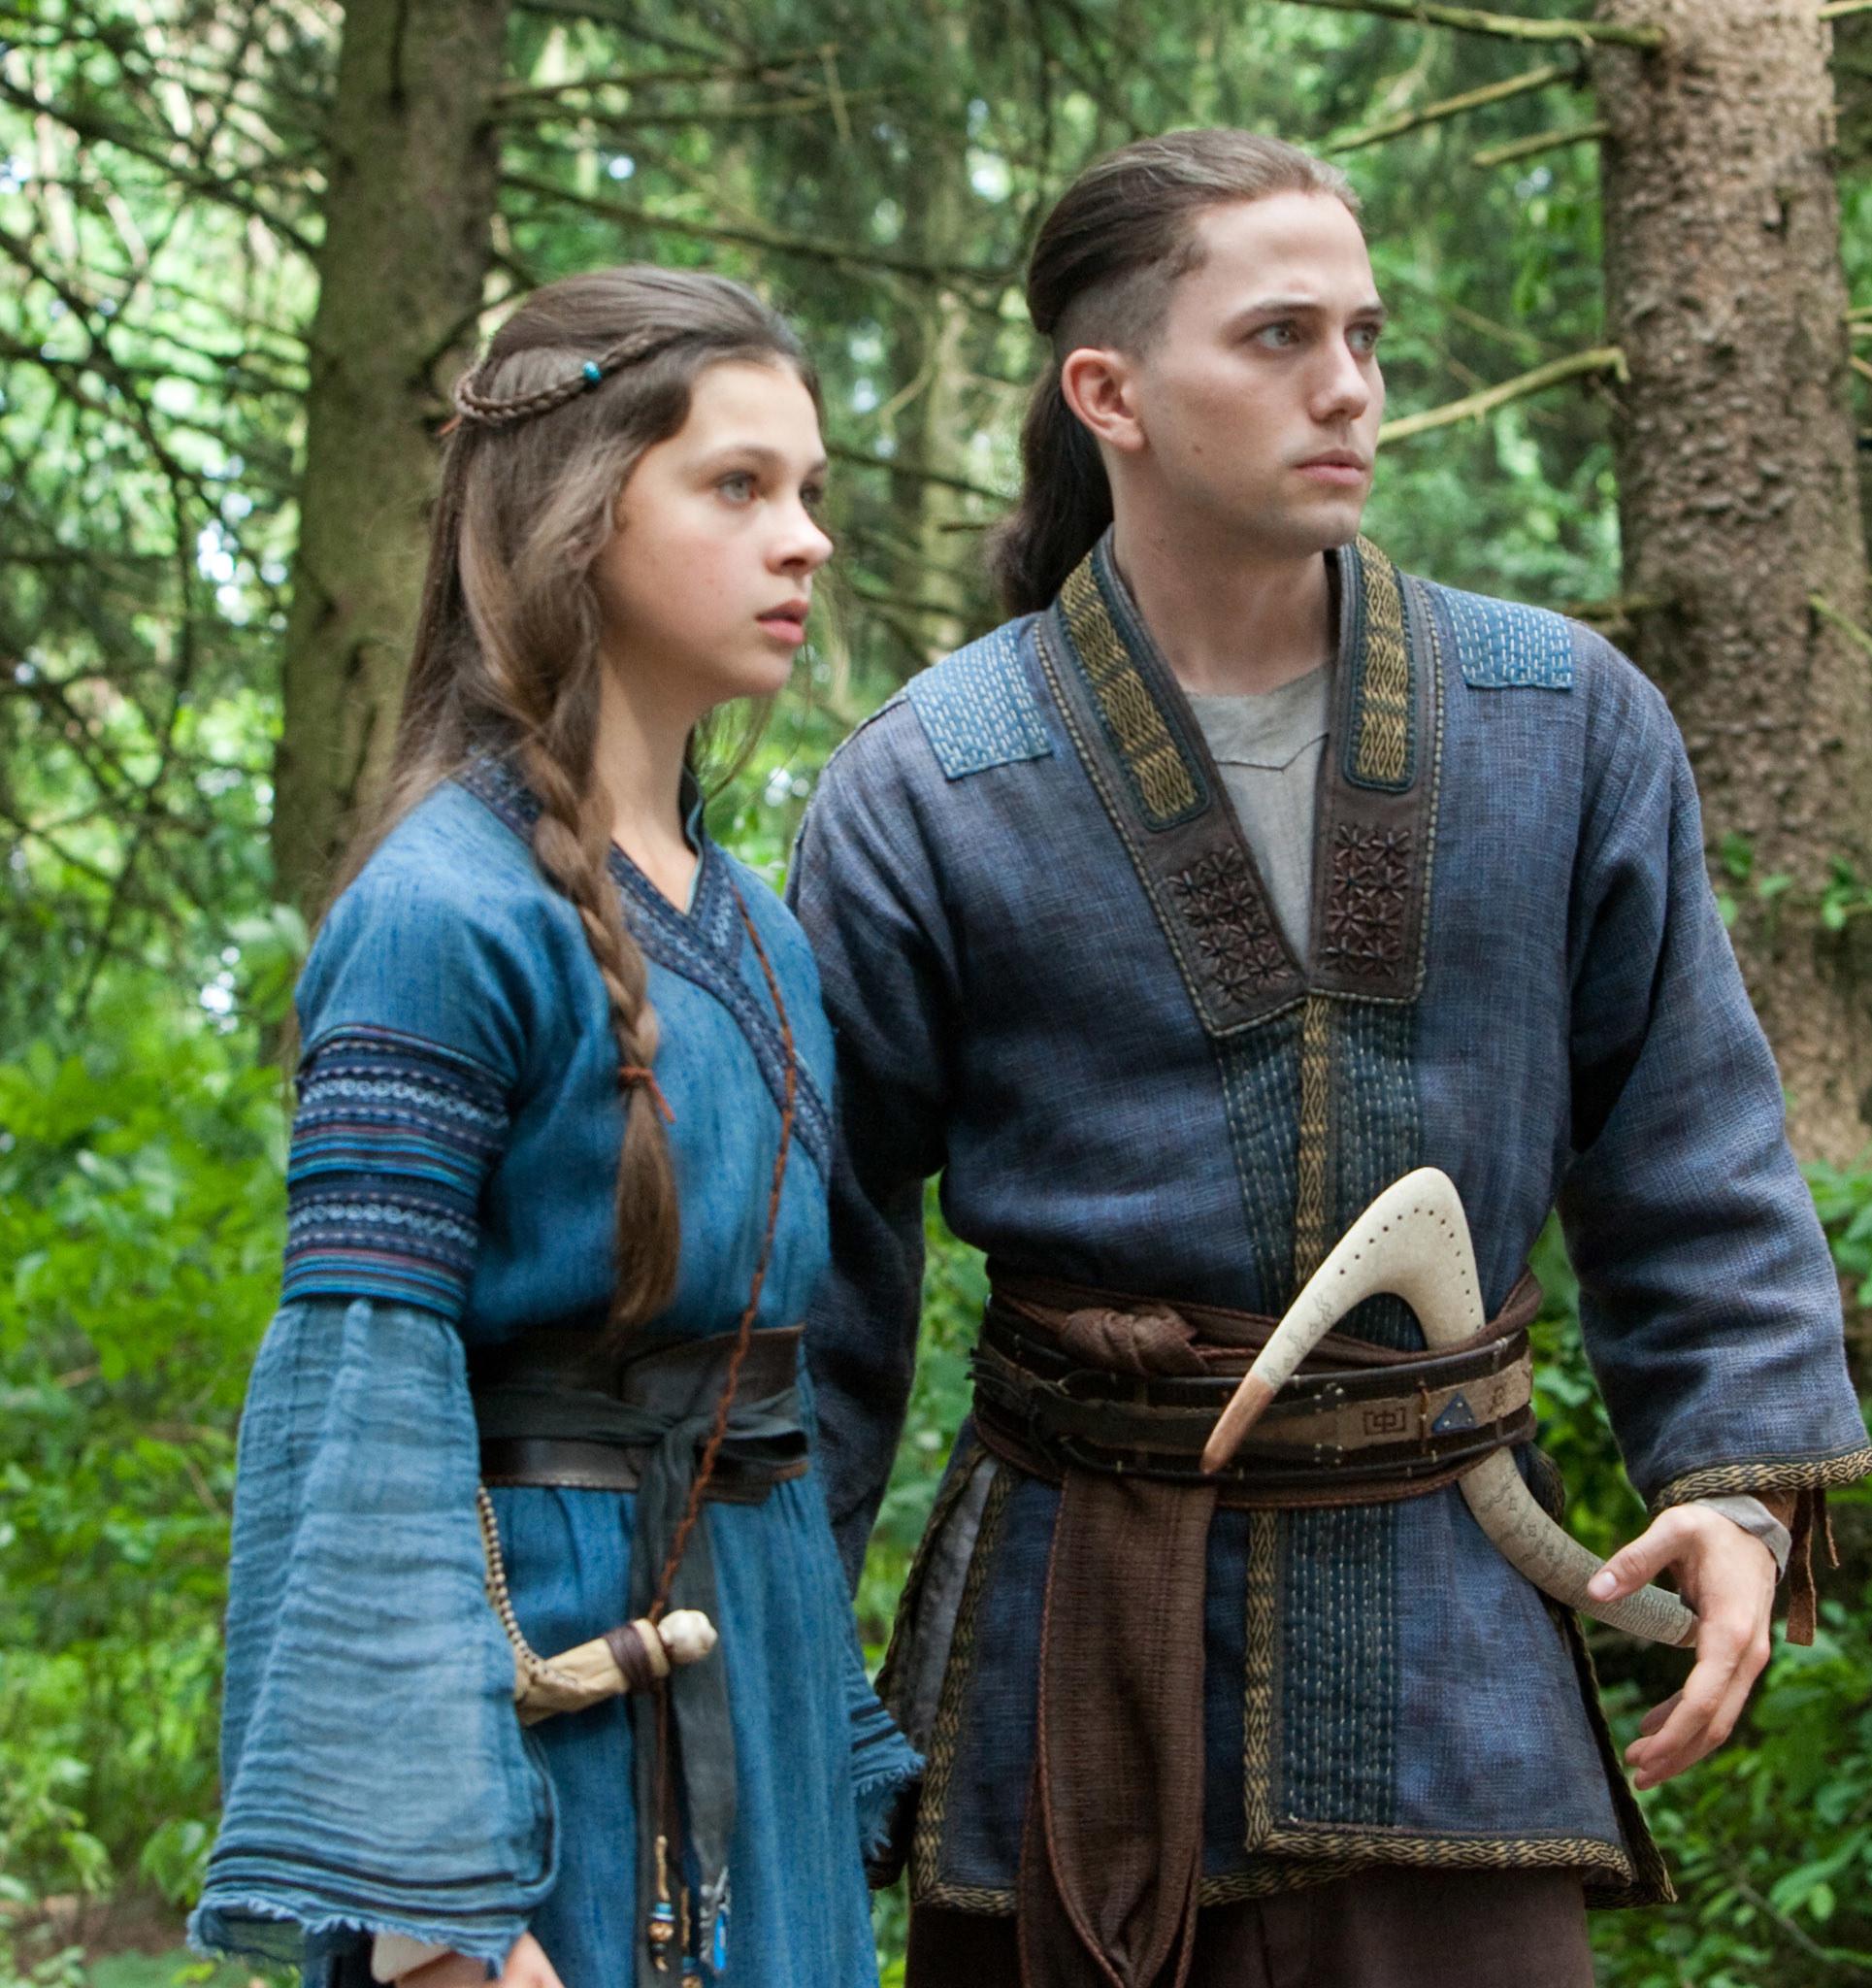 Sokka and Katara in the live action adaptation of Avatar the Last Airbender